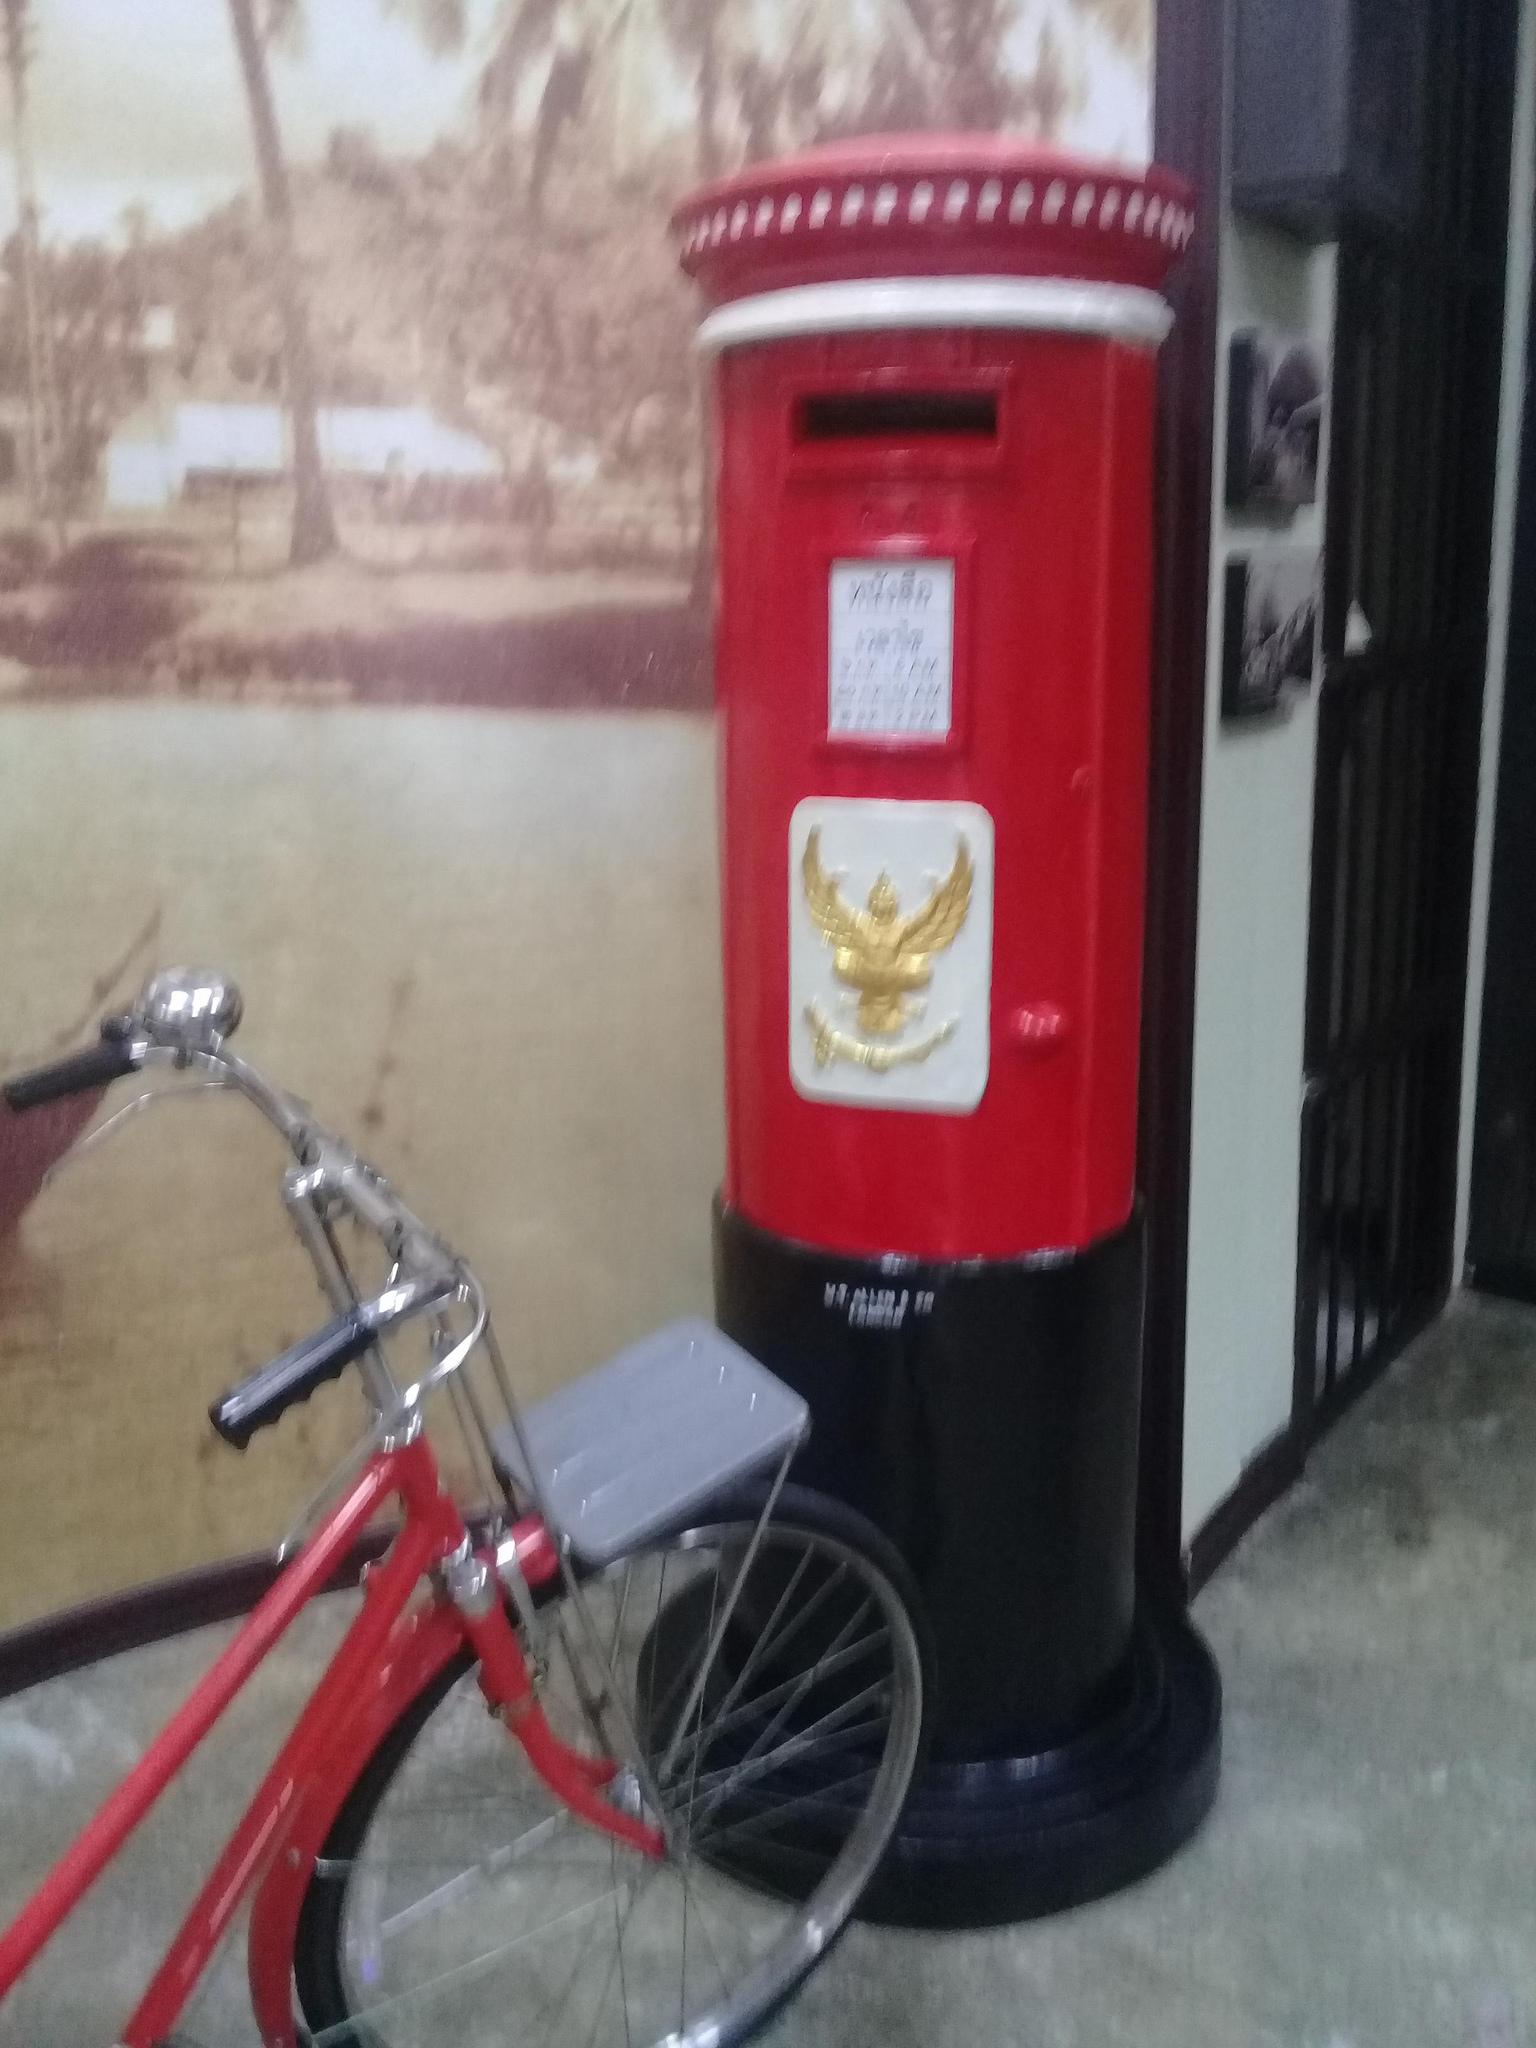 Thai pillar box at the Phuket Philatelic Museum. Photo taken on October 27, 2017.